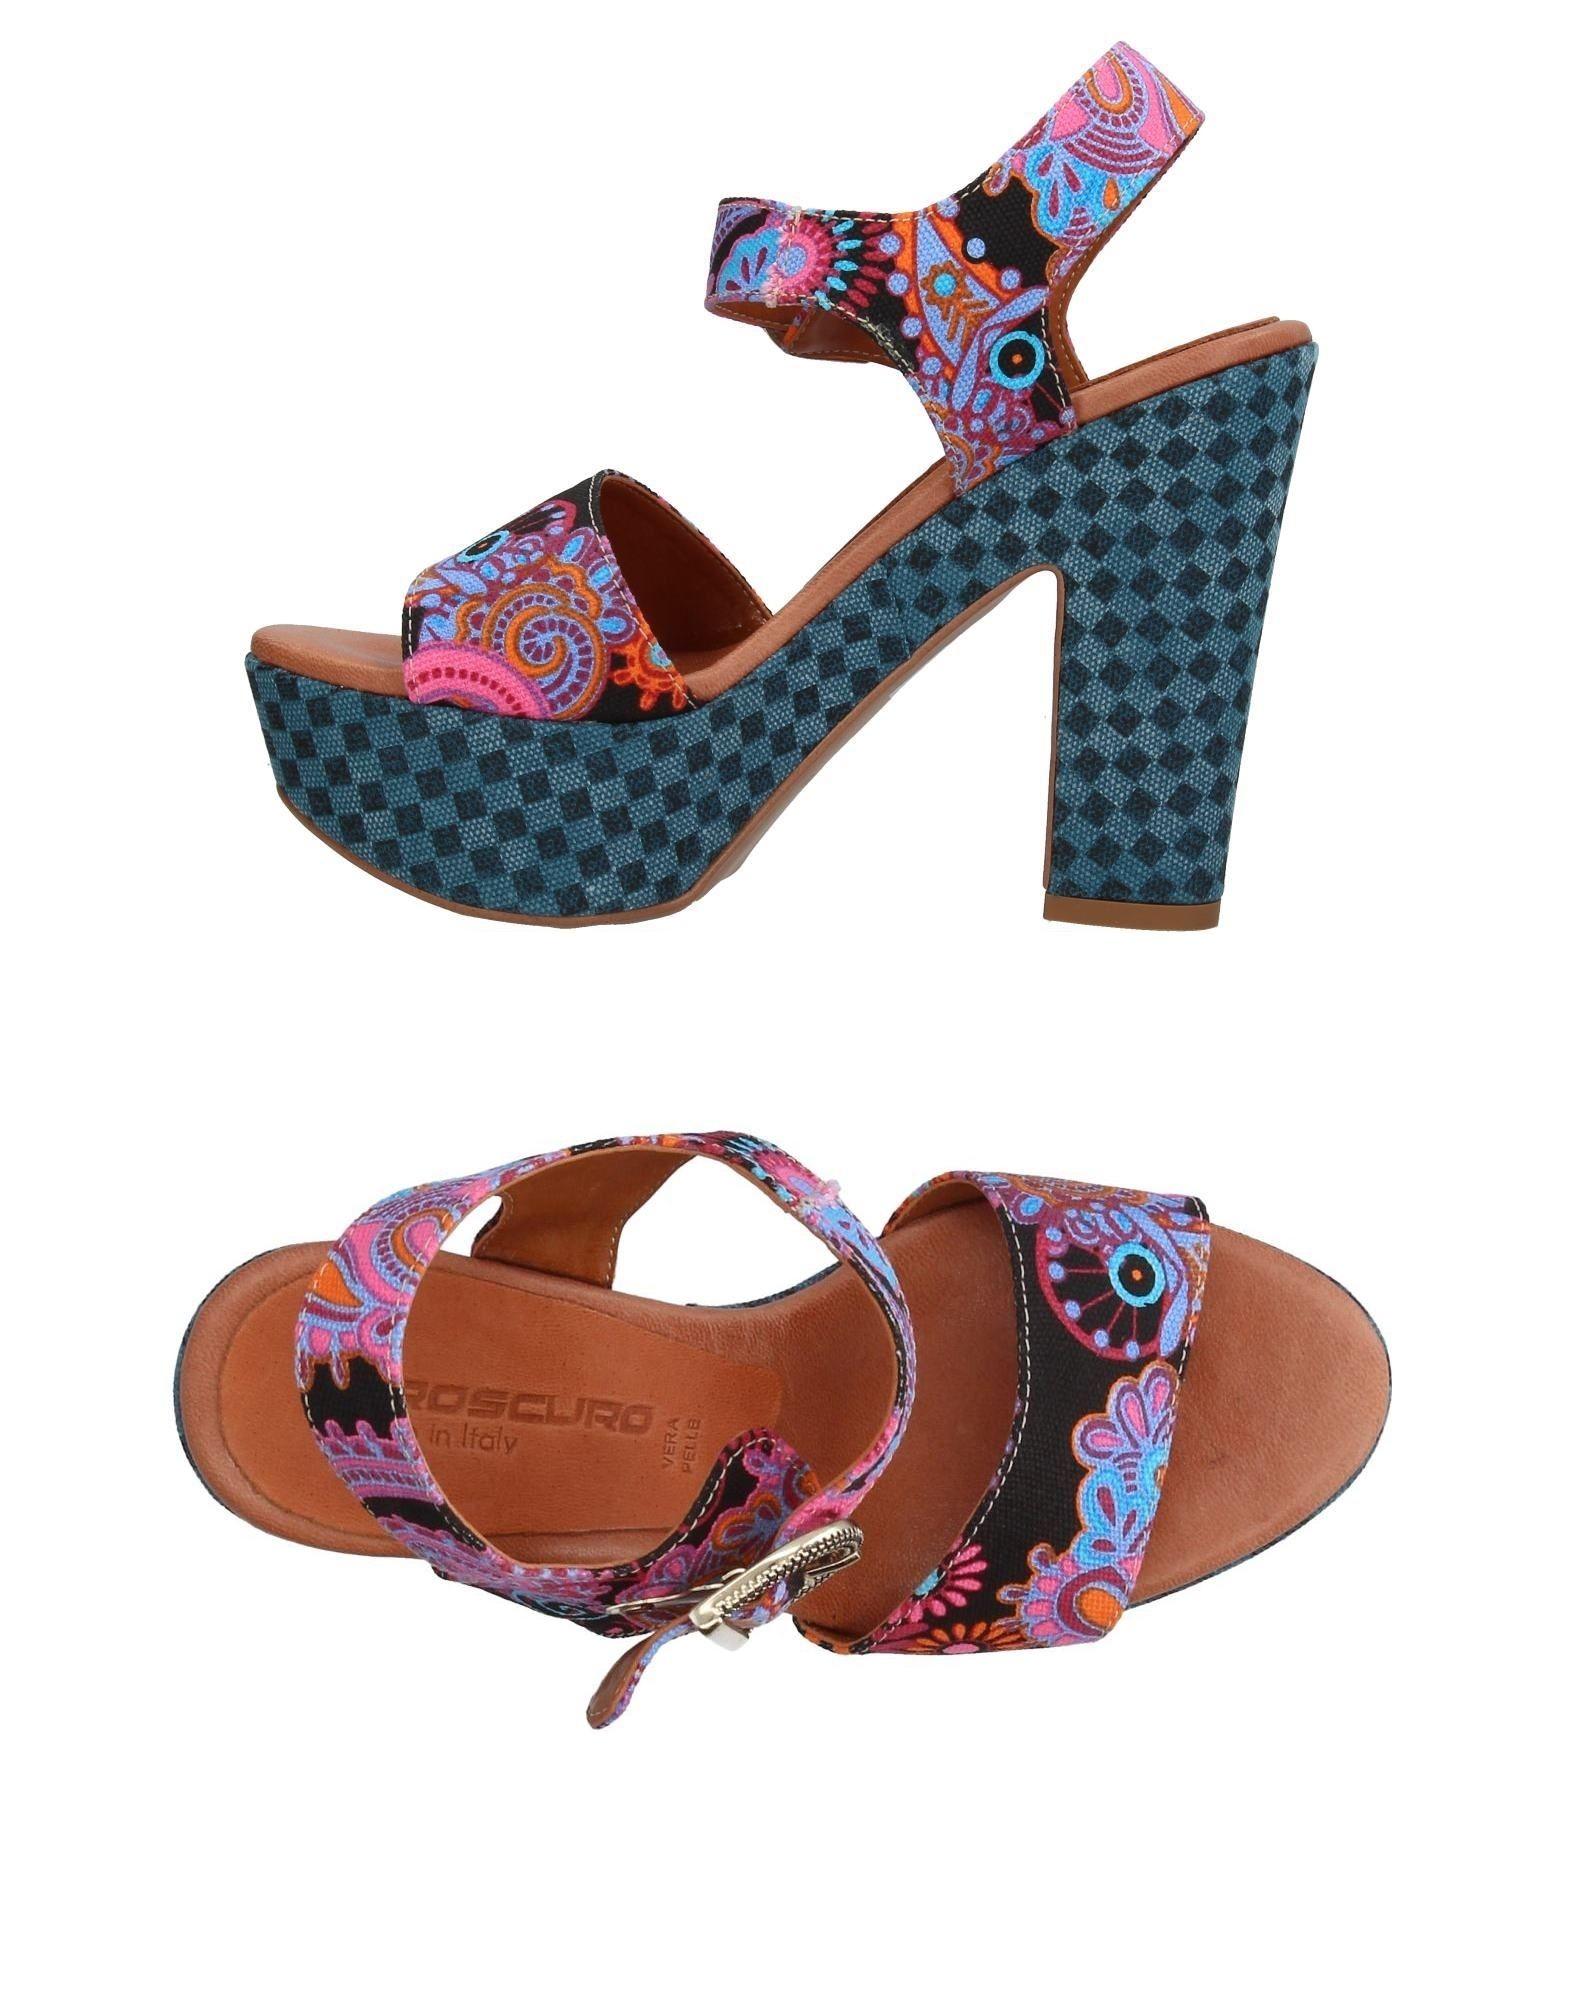 CHAUSSURES - Chaussures à lacetsJerold Wilton eNRNF